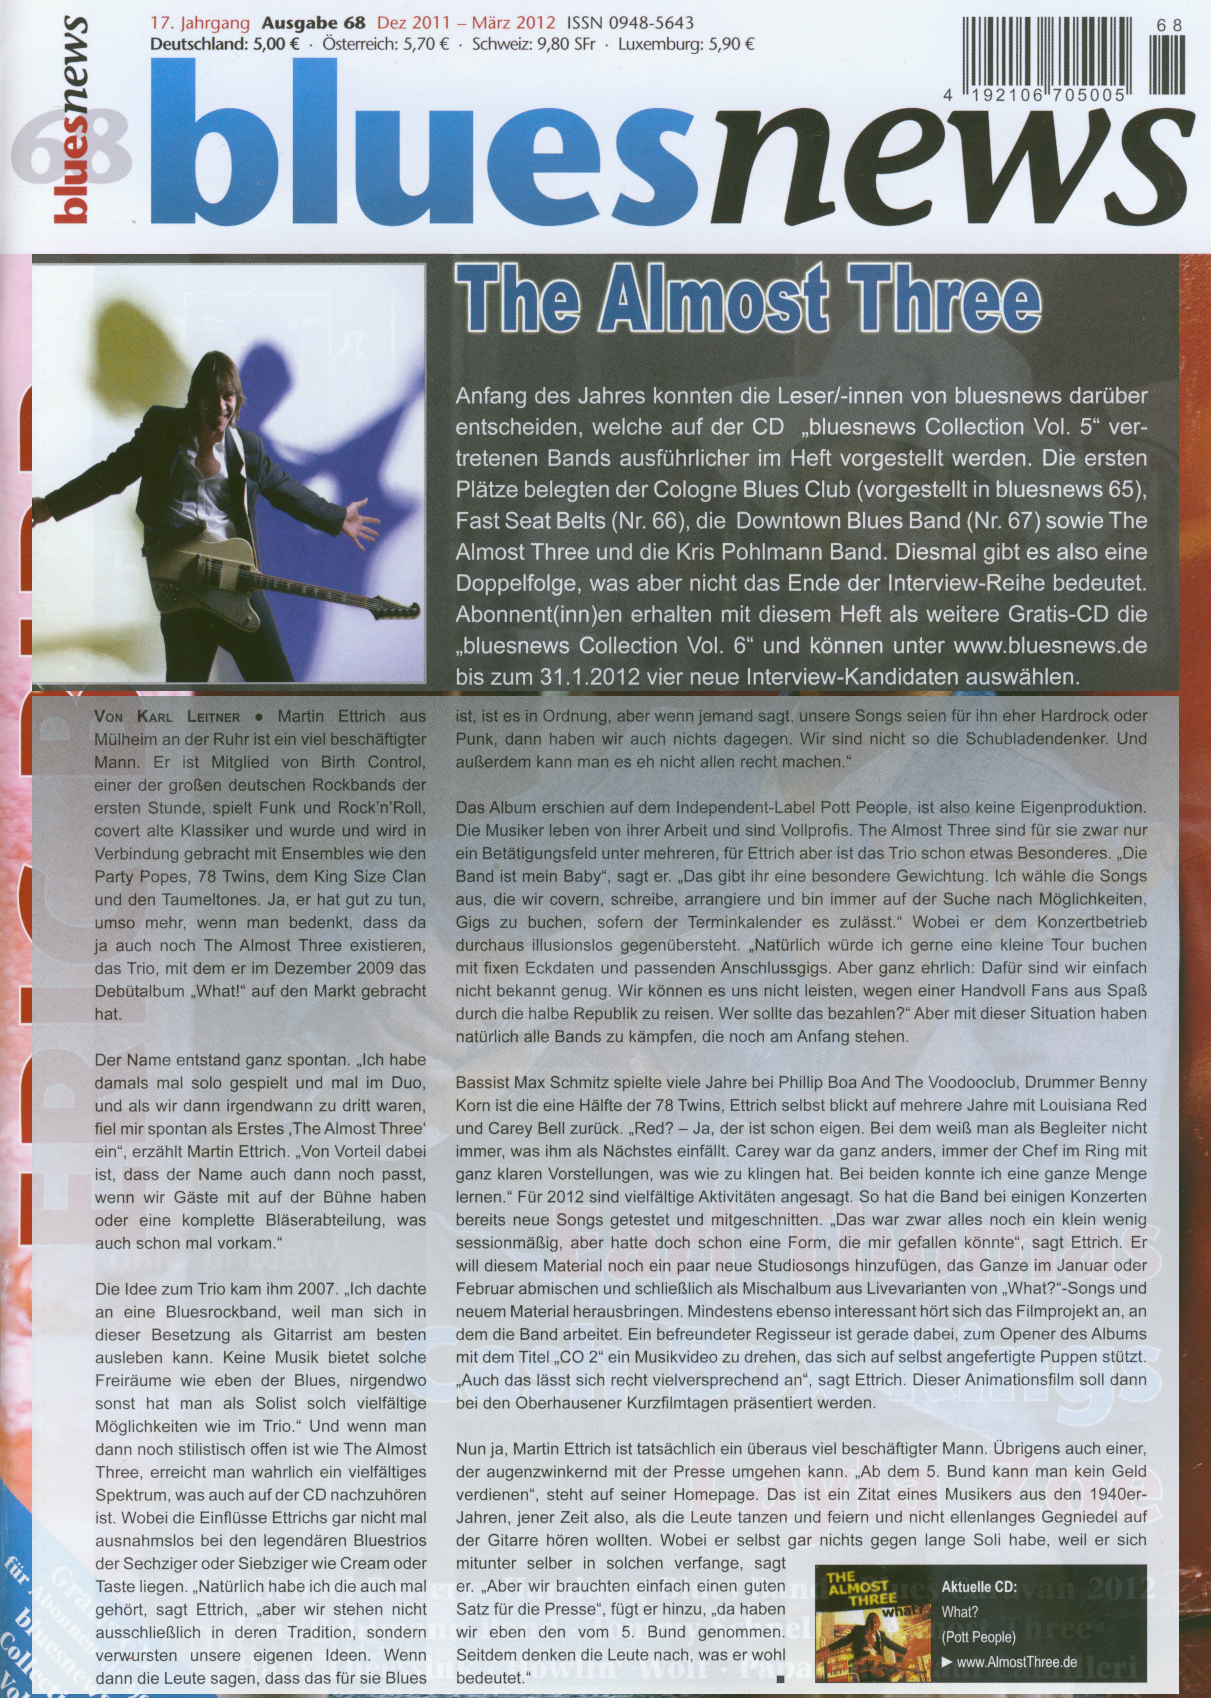 bluesnews-interview-ausgabe-68